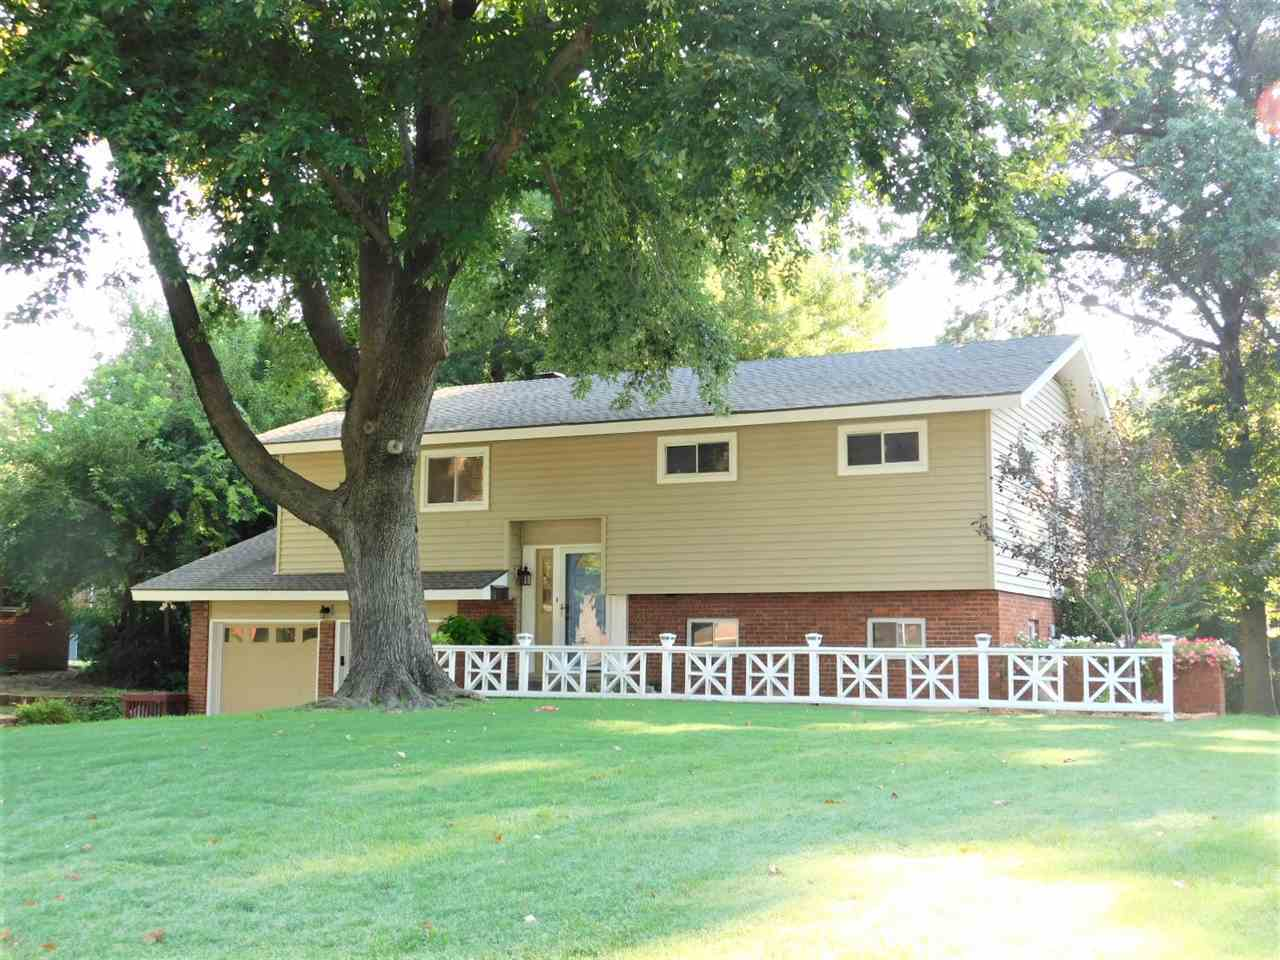 #century21groupone,#homesforsaleponcacity,#poncacityrealestate | 1905 Meadowbrook Ponca City, OK 74604 1